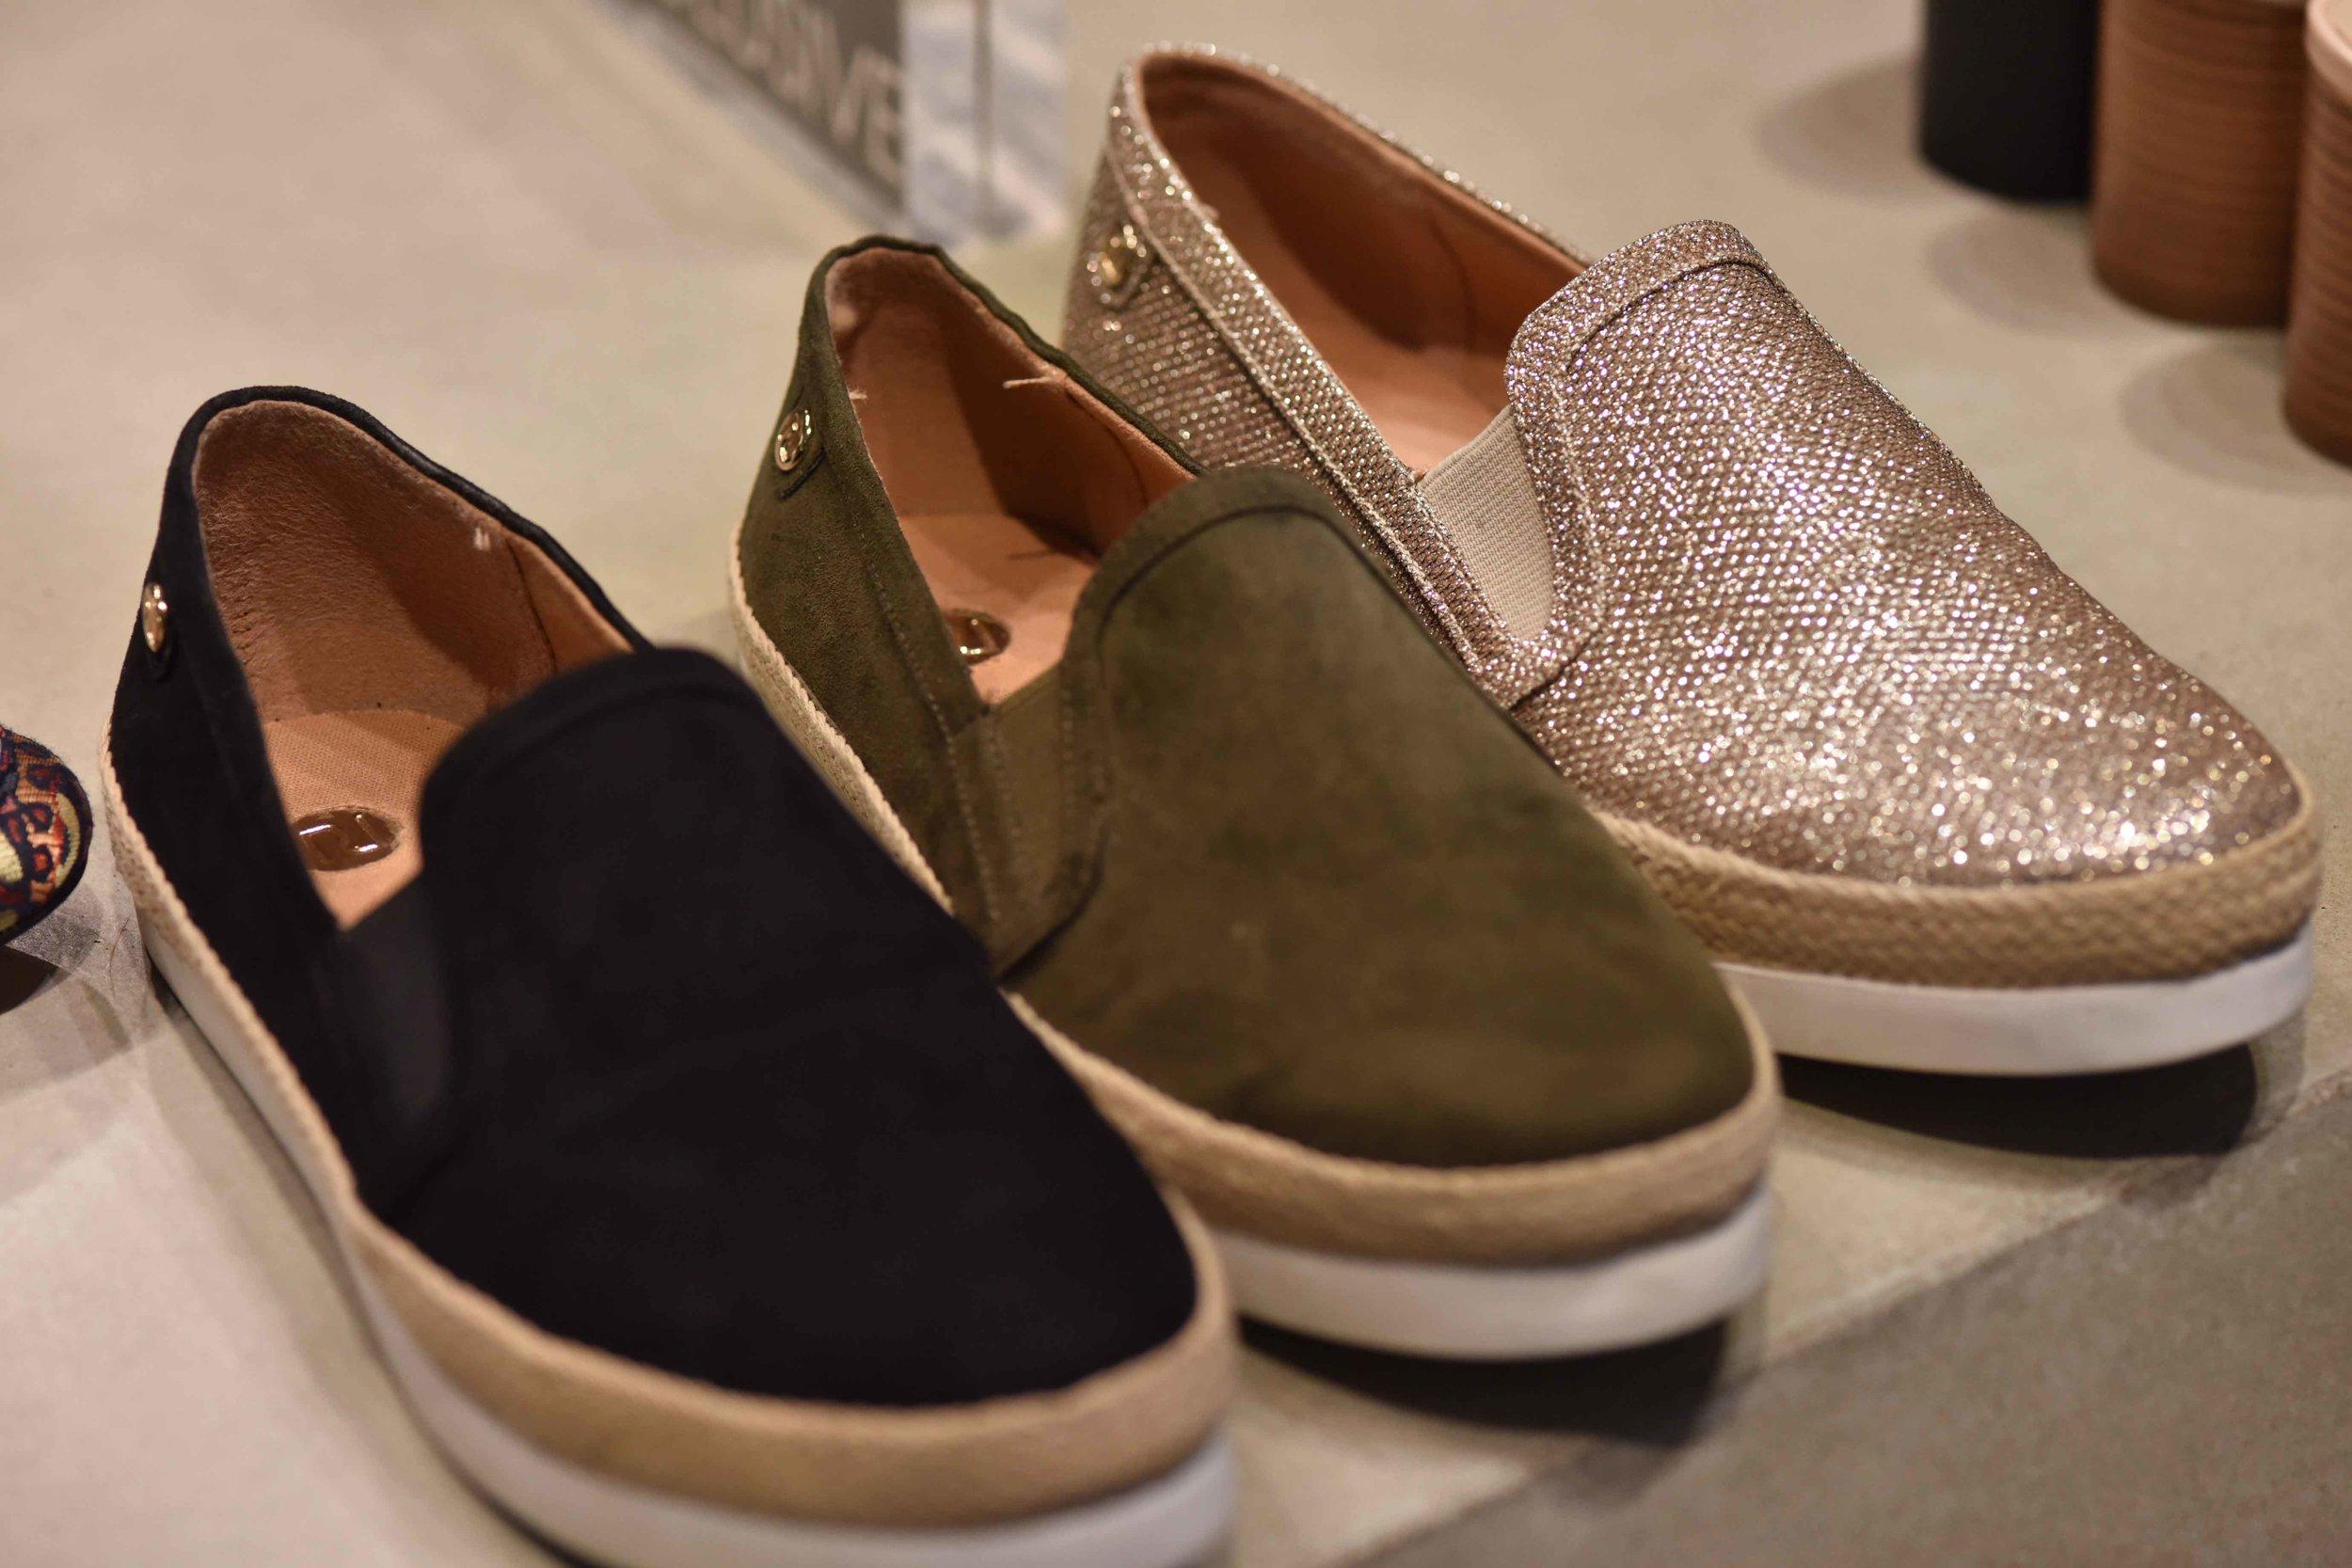 Selfridges, shoe section, London, U.K. Image©sourcingstyle.com